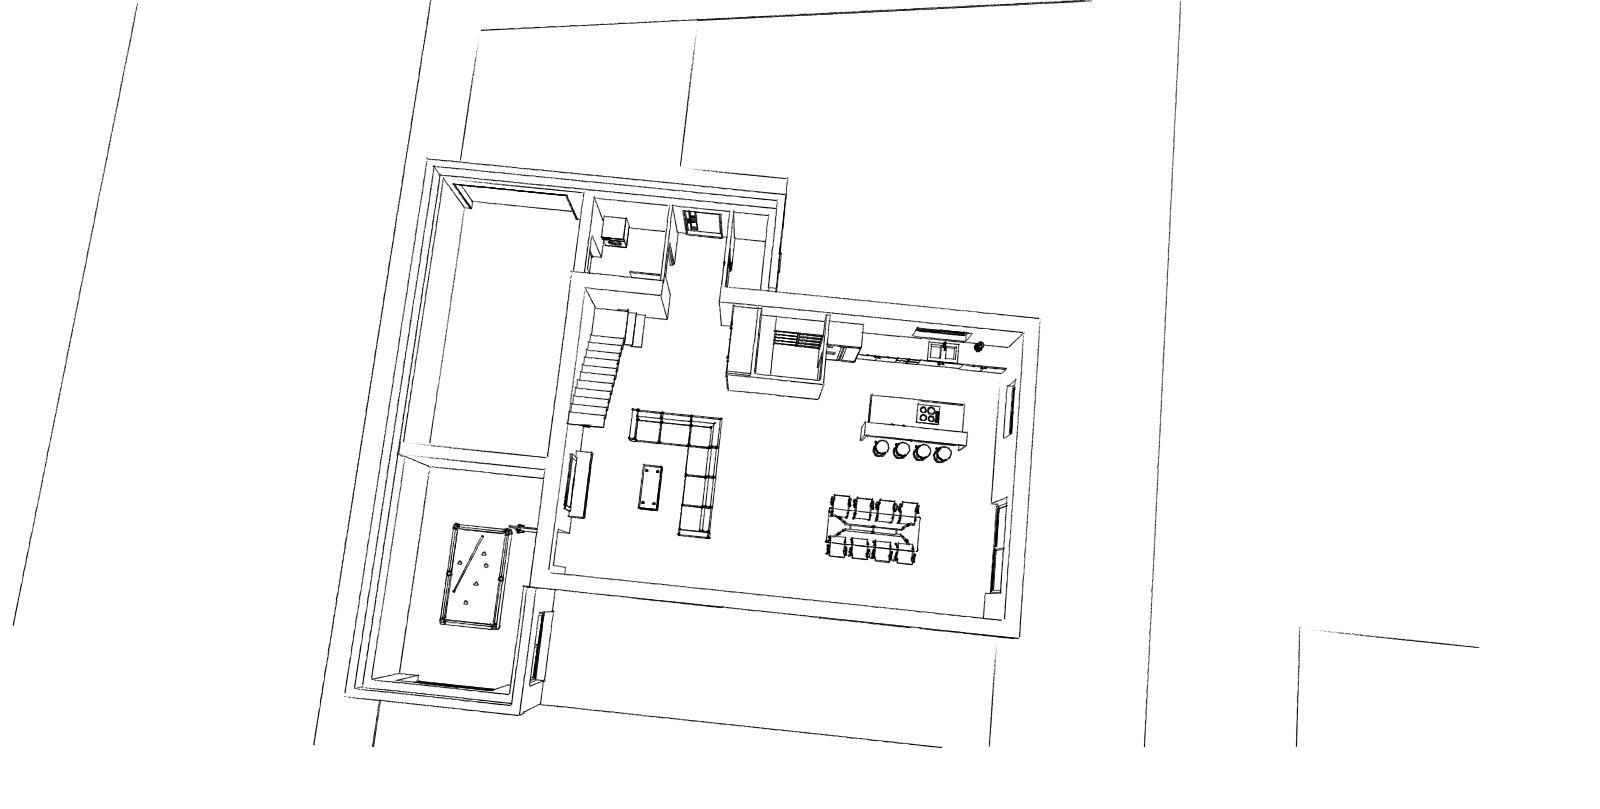 permis de construire architecte Lille 18